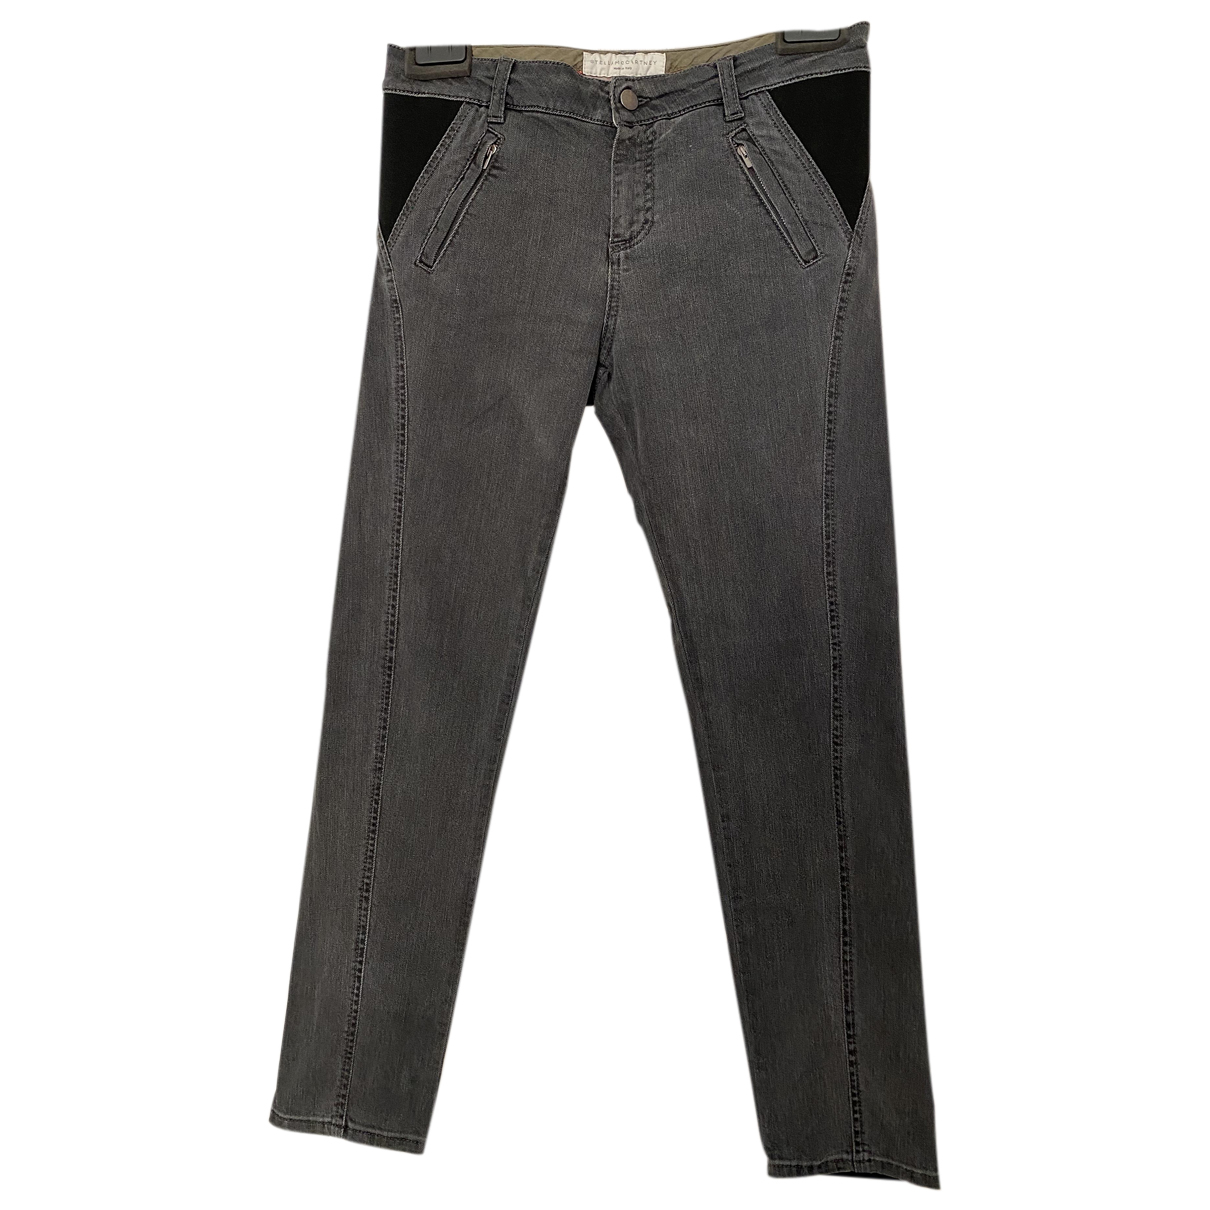 Stella Mccartney - Jean   pour femme en coton - elasthane - gris